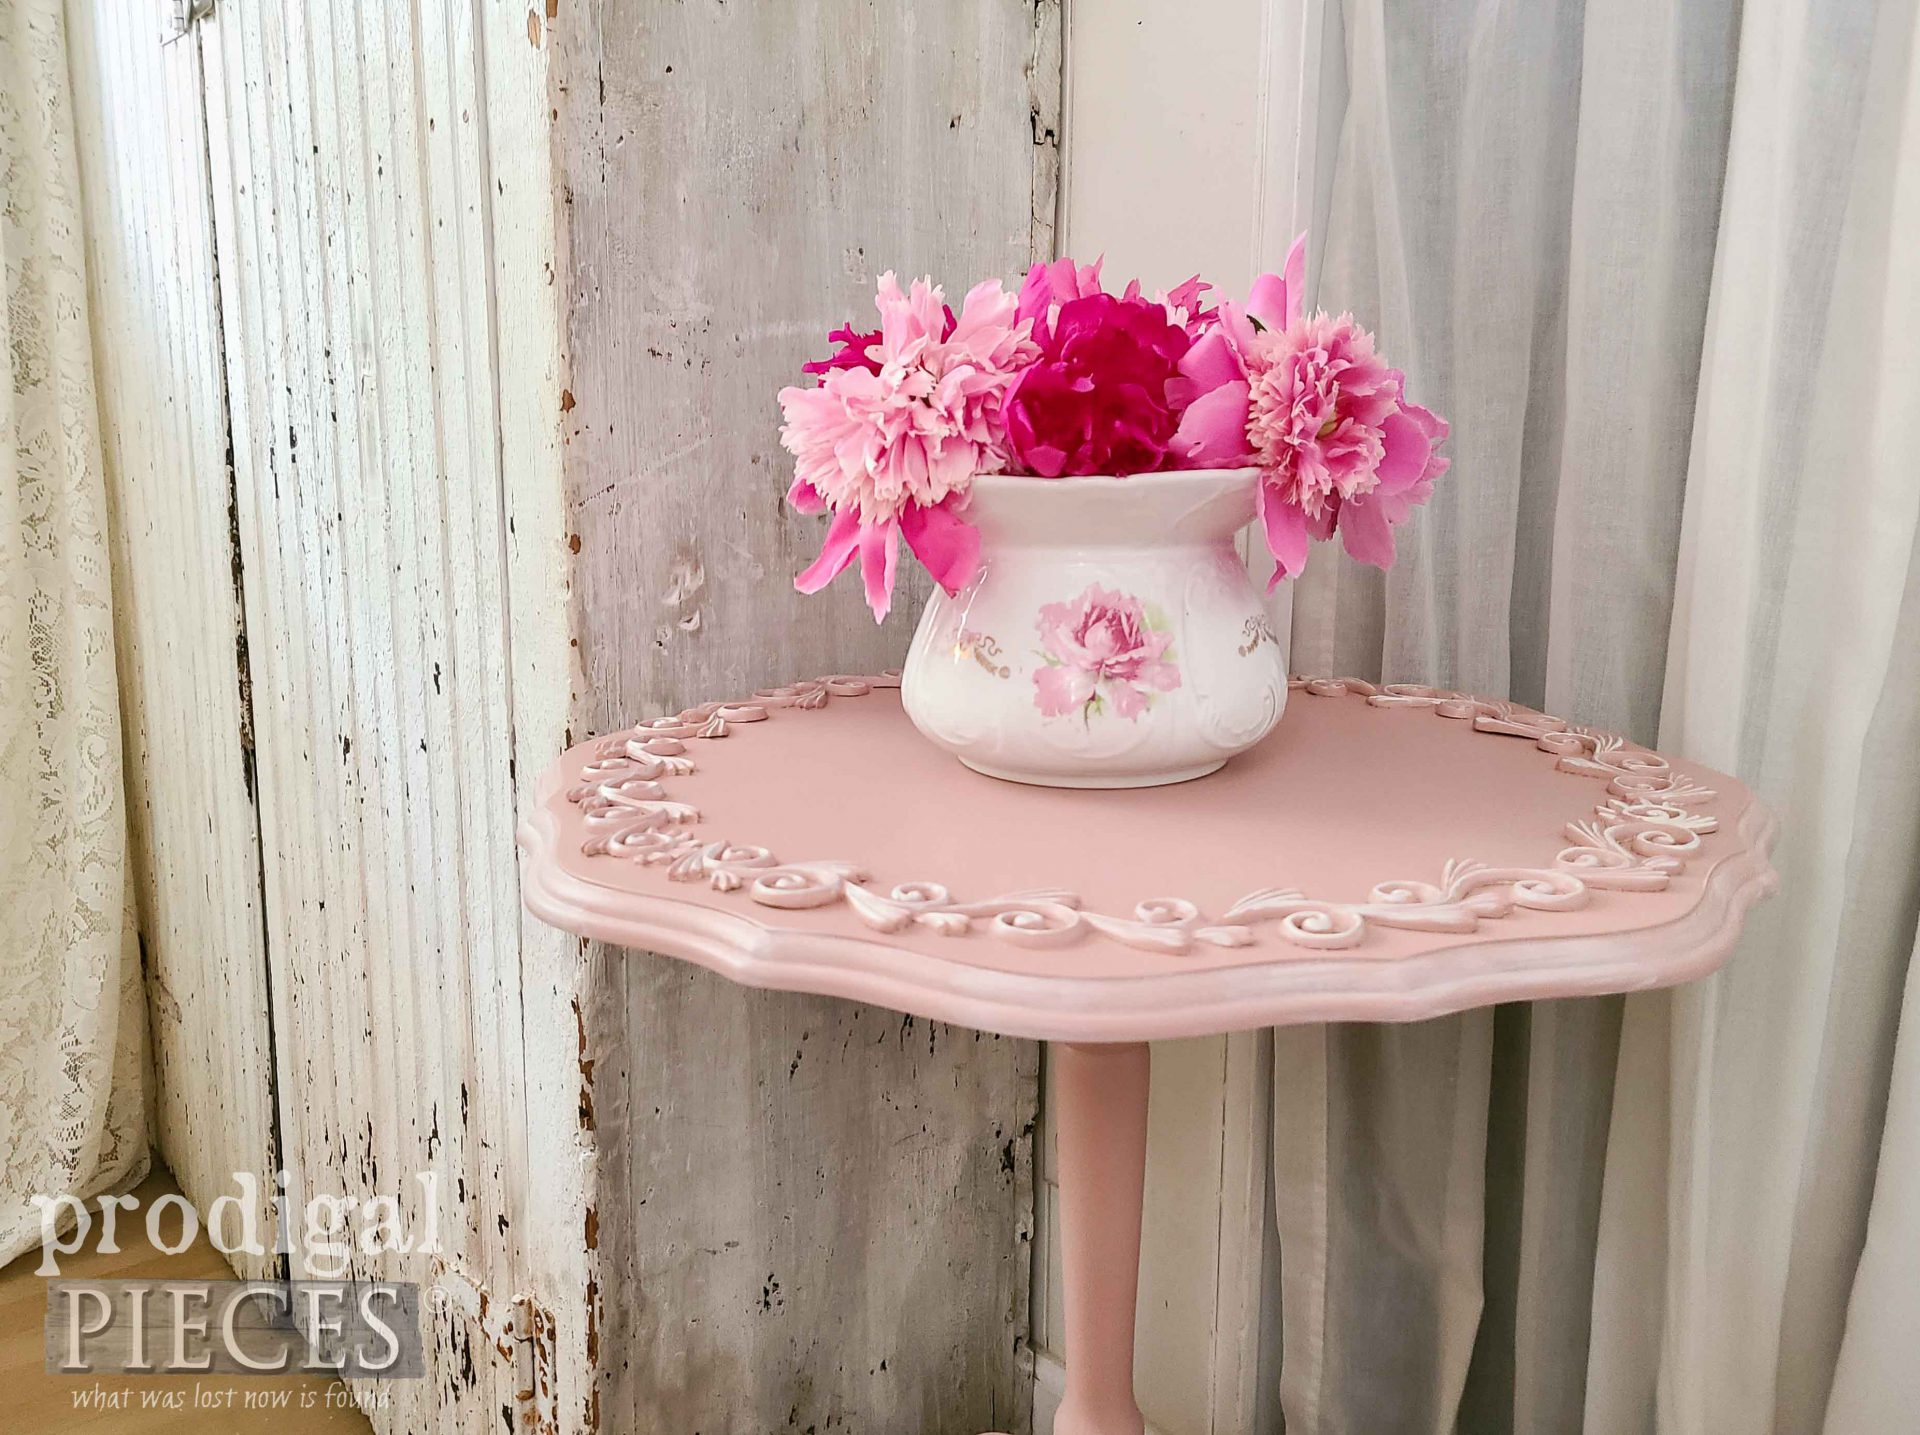 Pink Drop Leaf Tilt Top Table by Larissa of Prodigal Pieces | prodigalpieces.com #prodigalpieces #pink